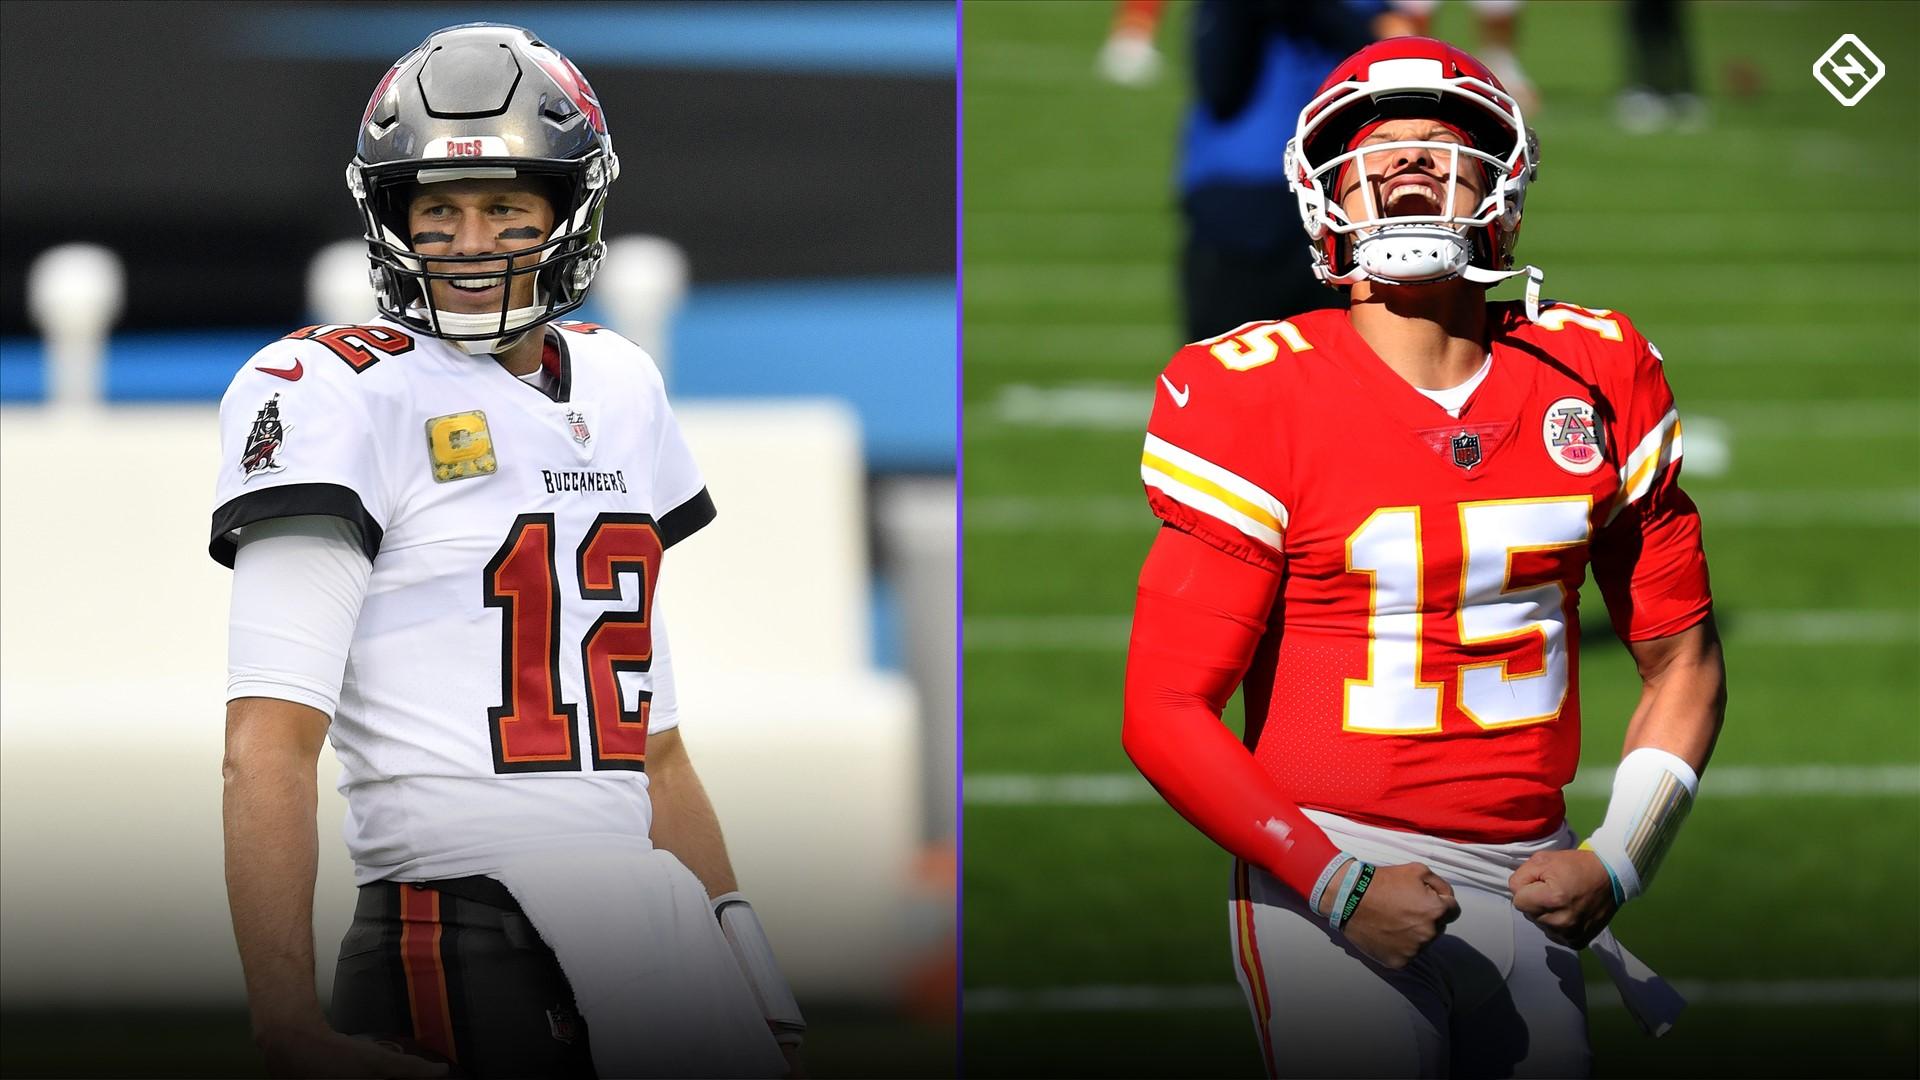 Future Vs Now (Mahomes Vs Brady Super Bowl)